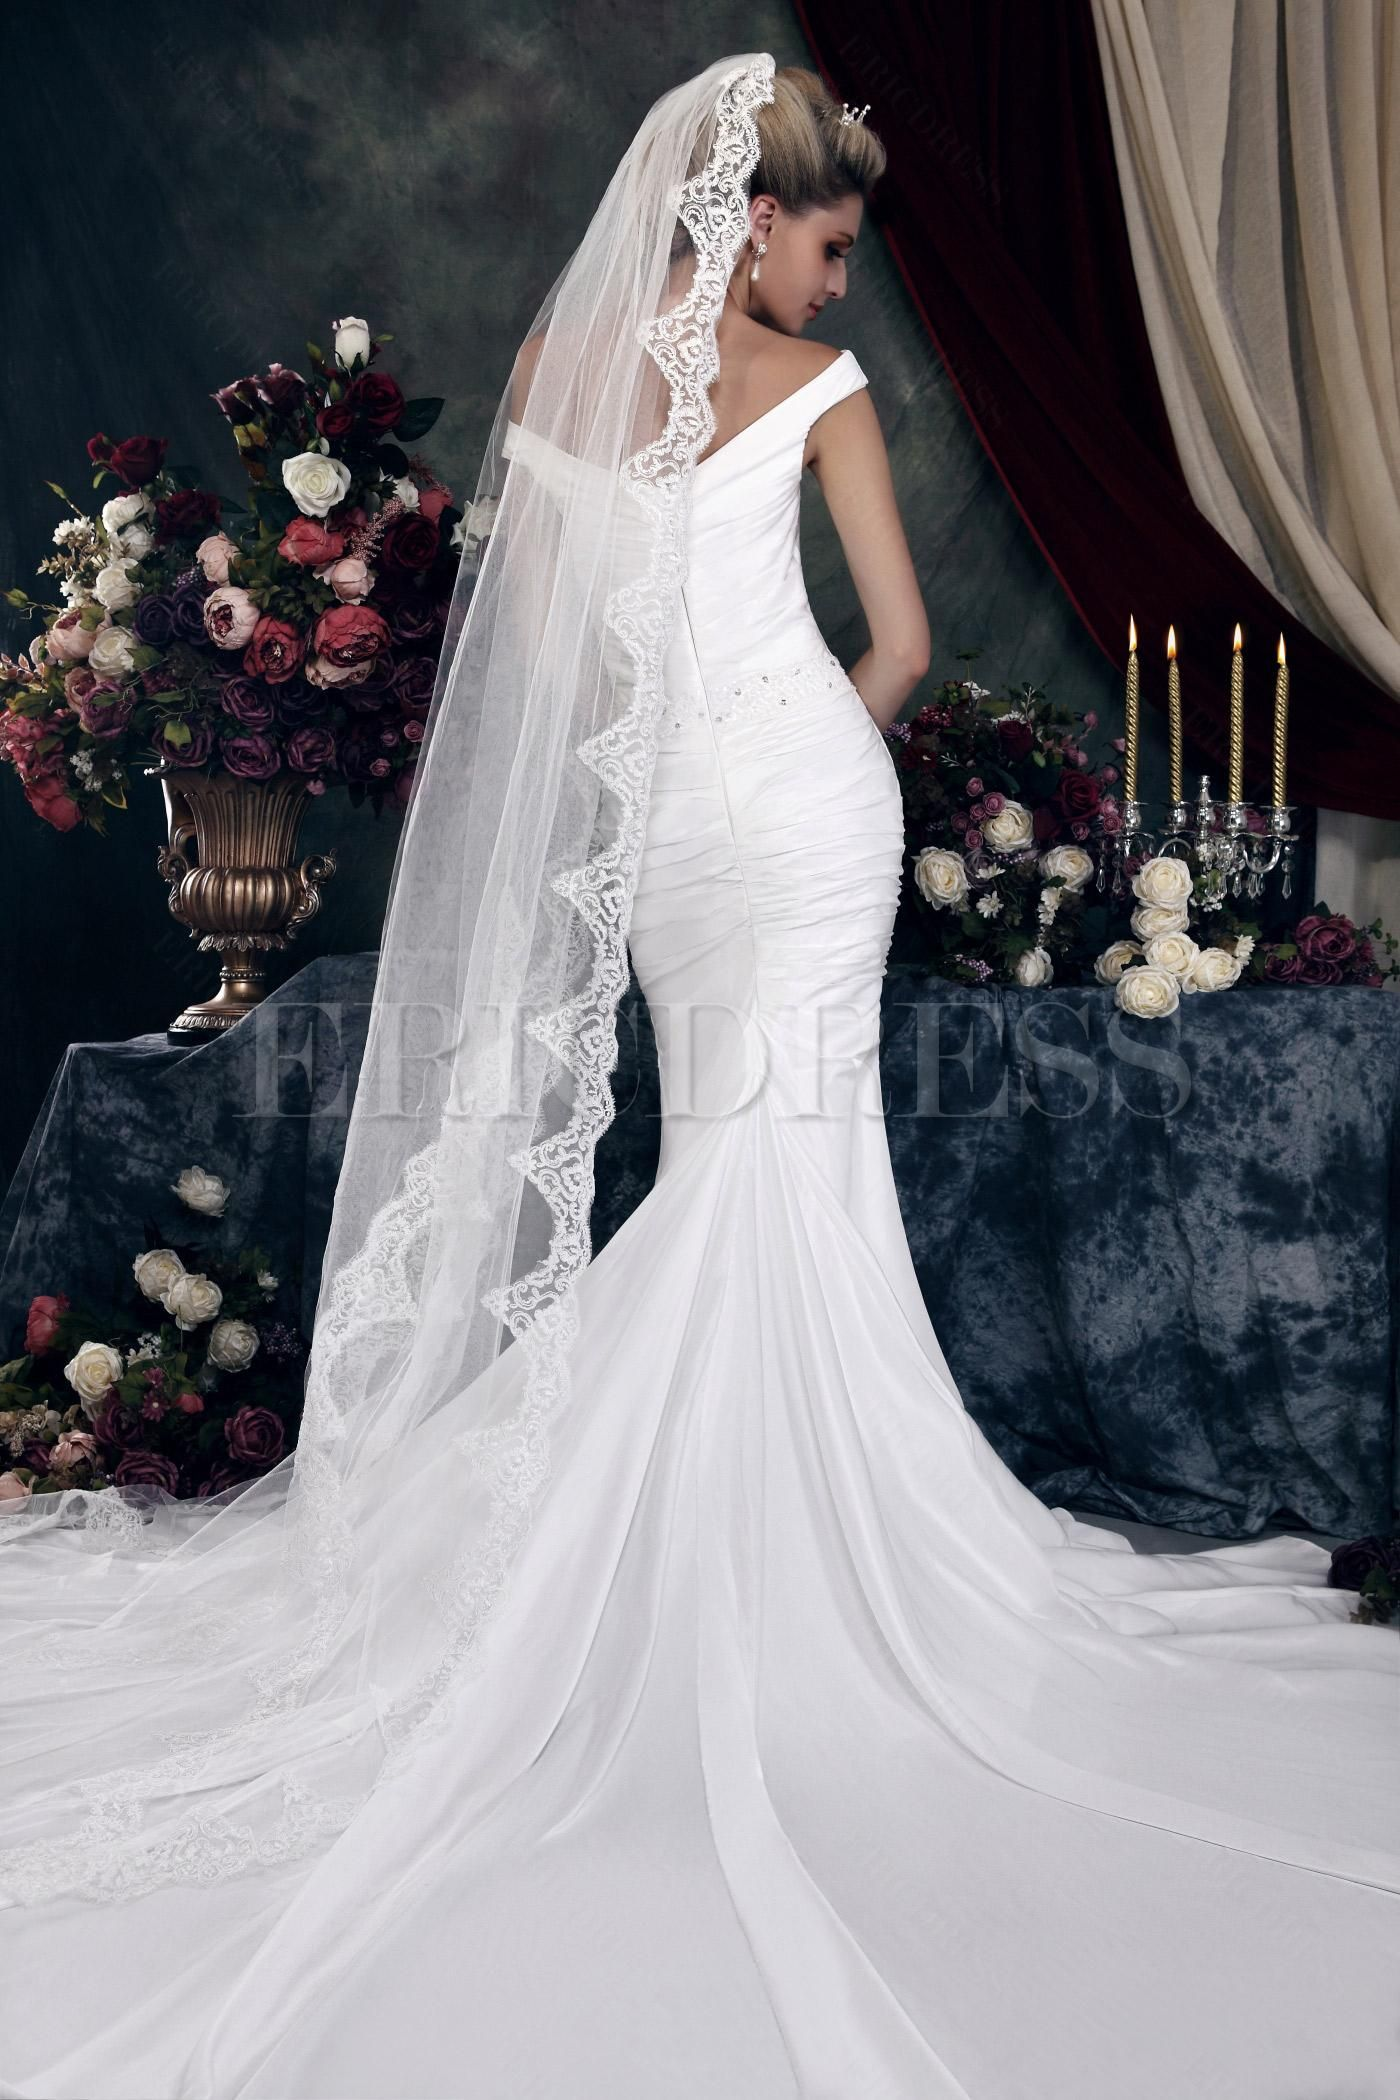 Elegant Trumpet/Mermaid V-neck Off-the-Shoulder Sleeveless Dashas Wedding Dress